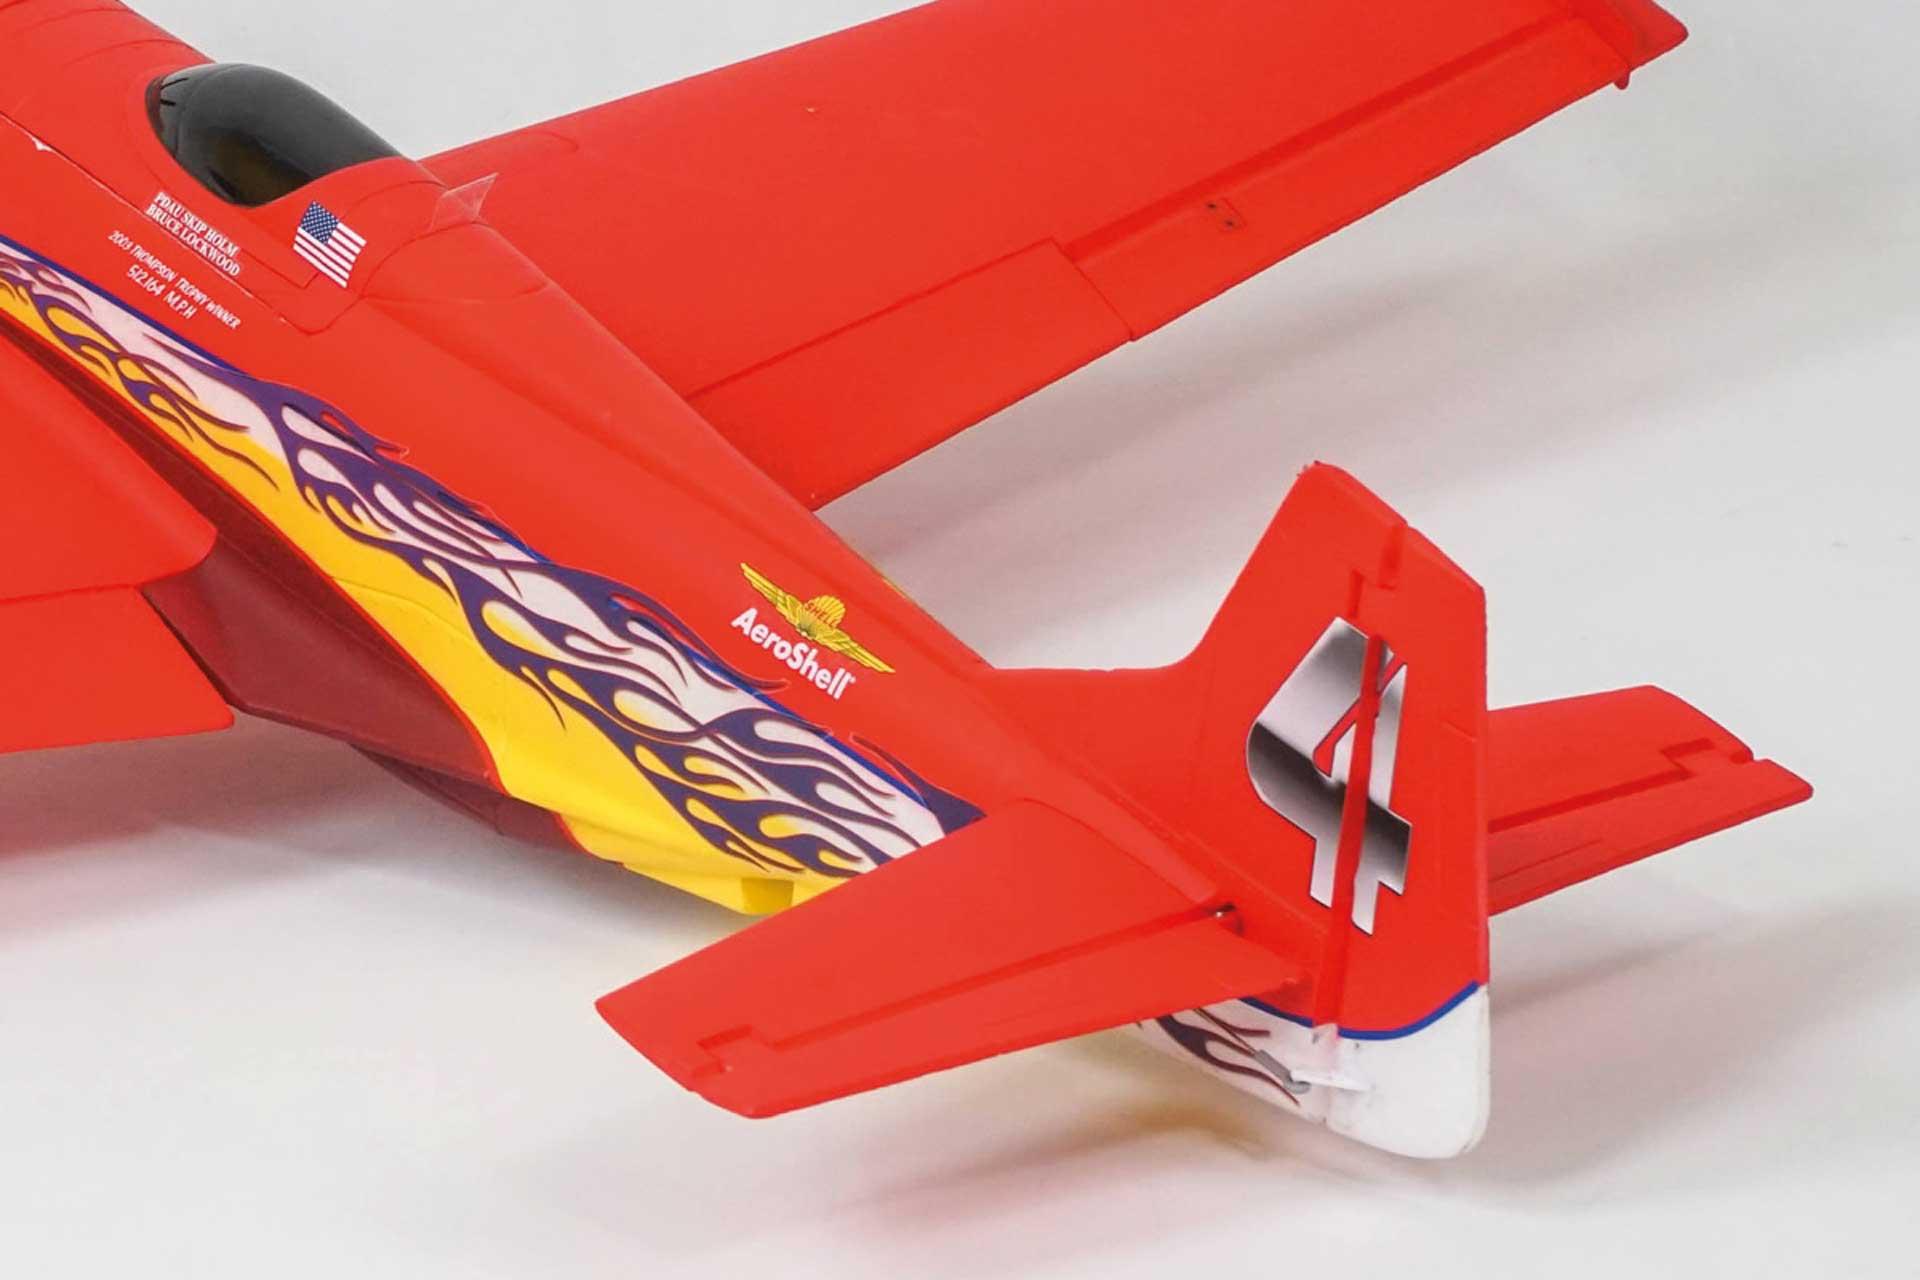 P-51 Dago Red fms